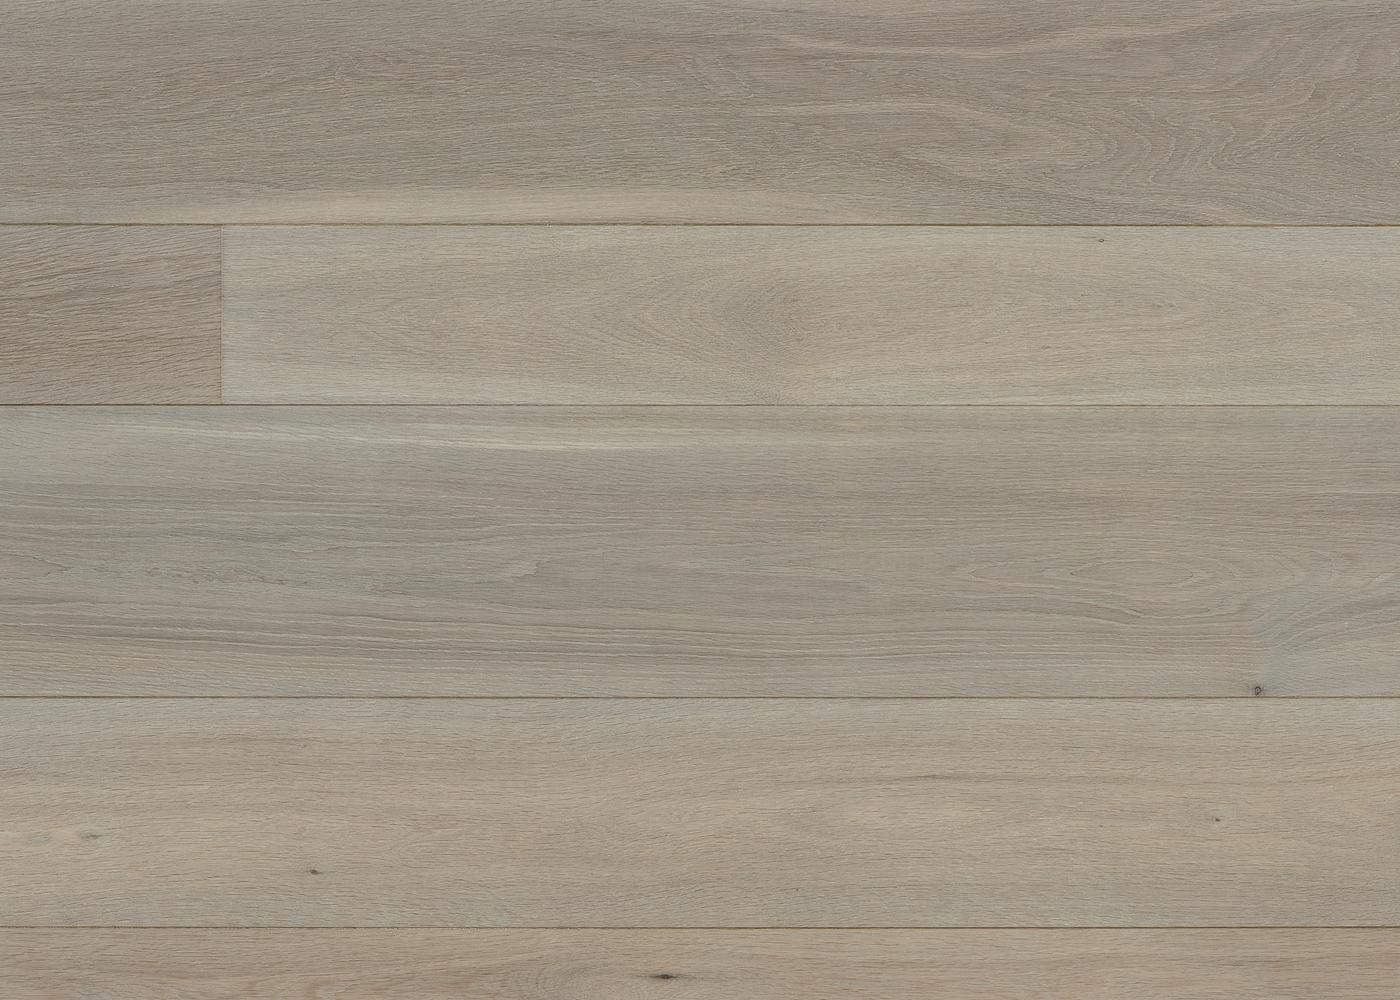 Parquet chêne contrecollé BALTIMORE vernis aqua ultra mat PRBis 14x148x2200